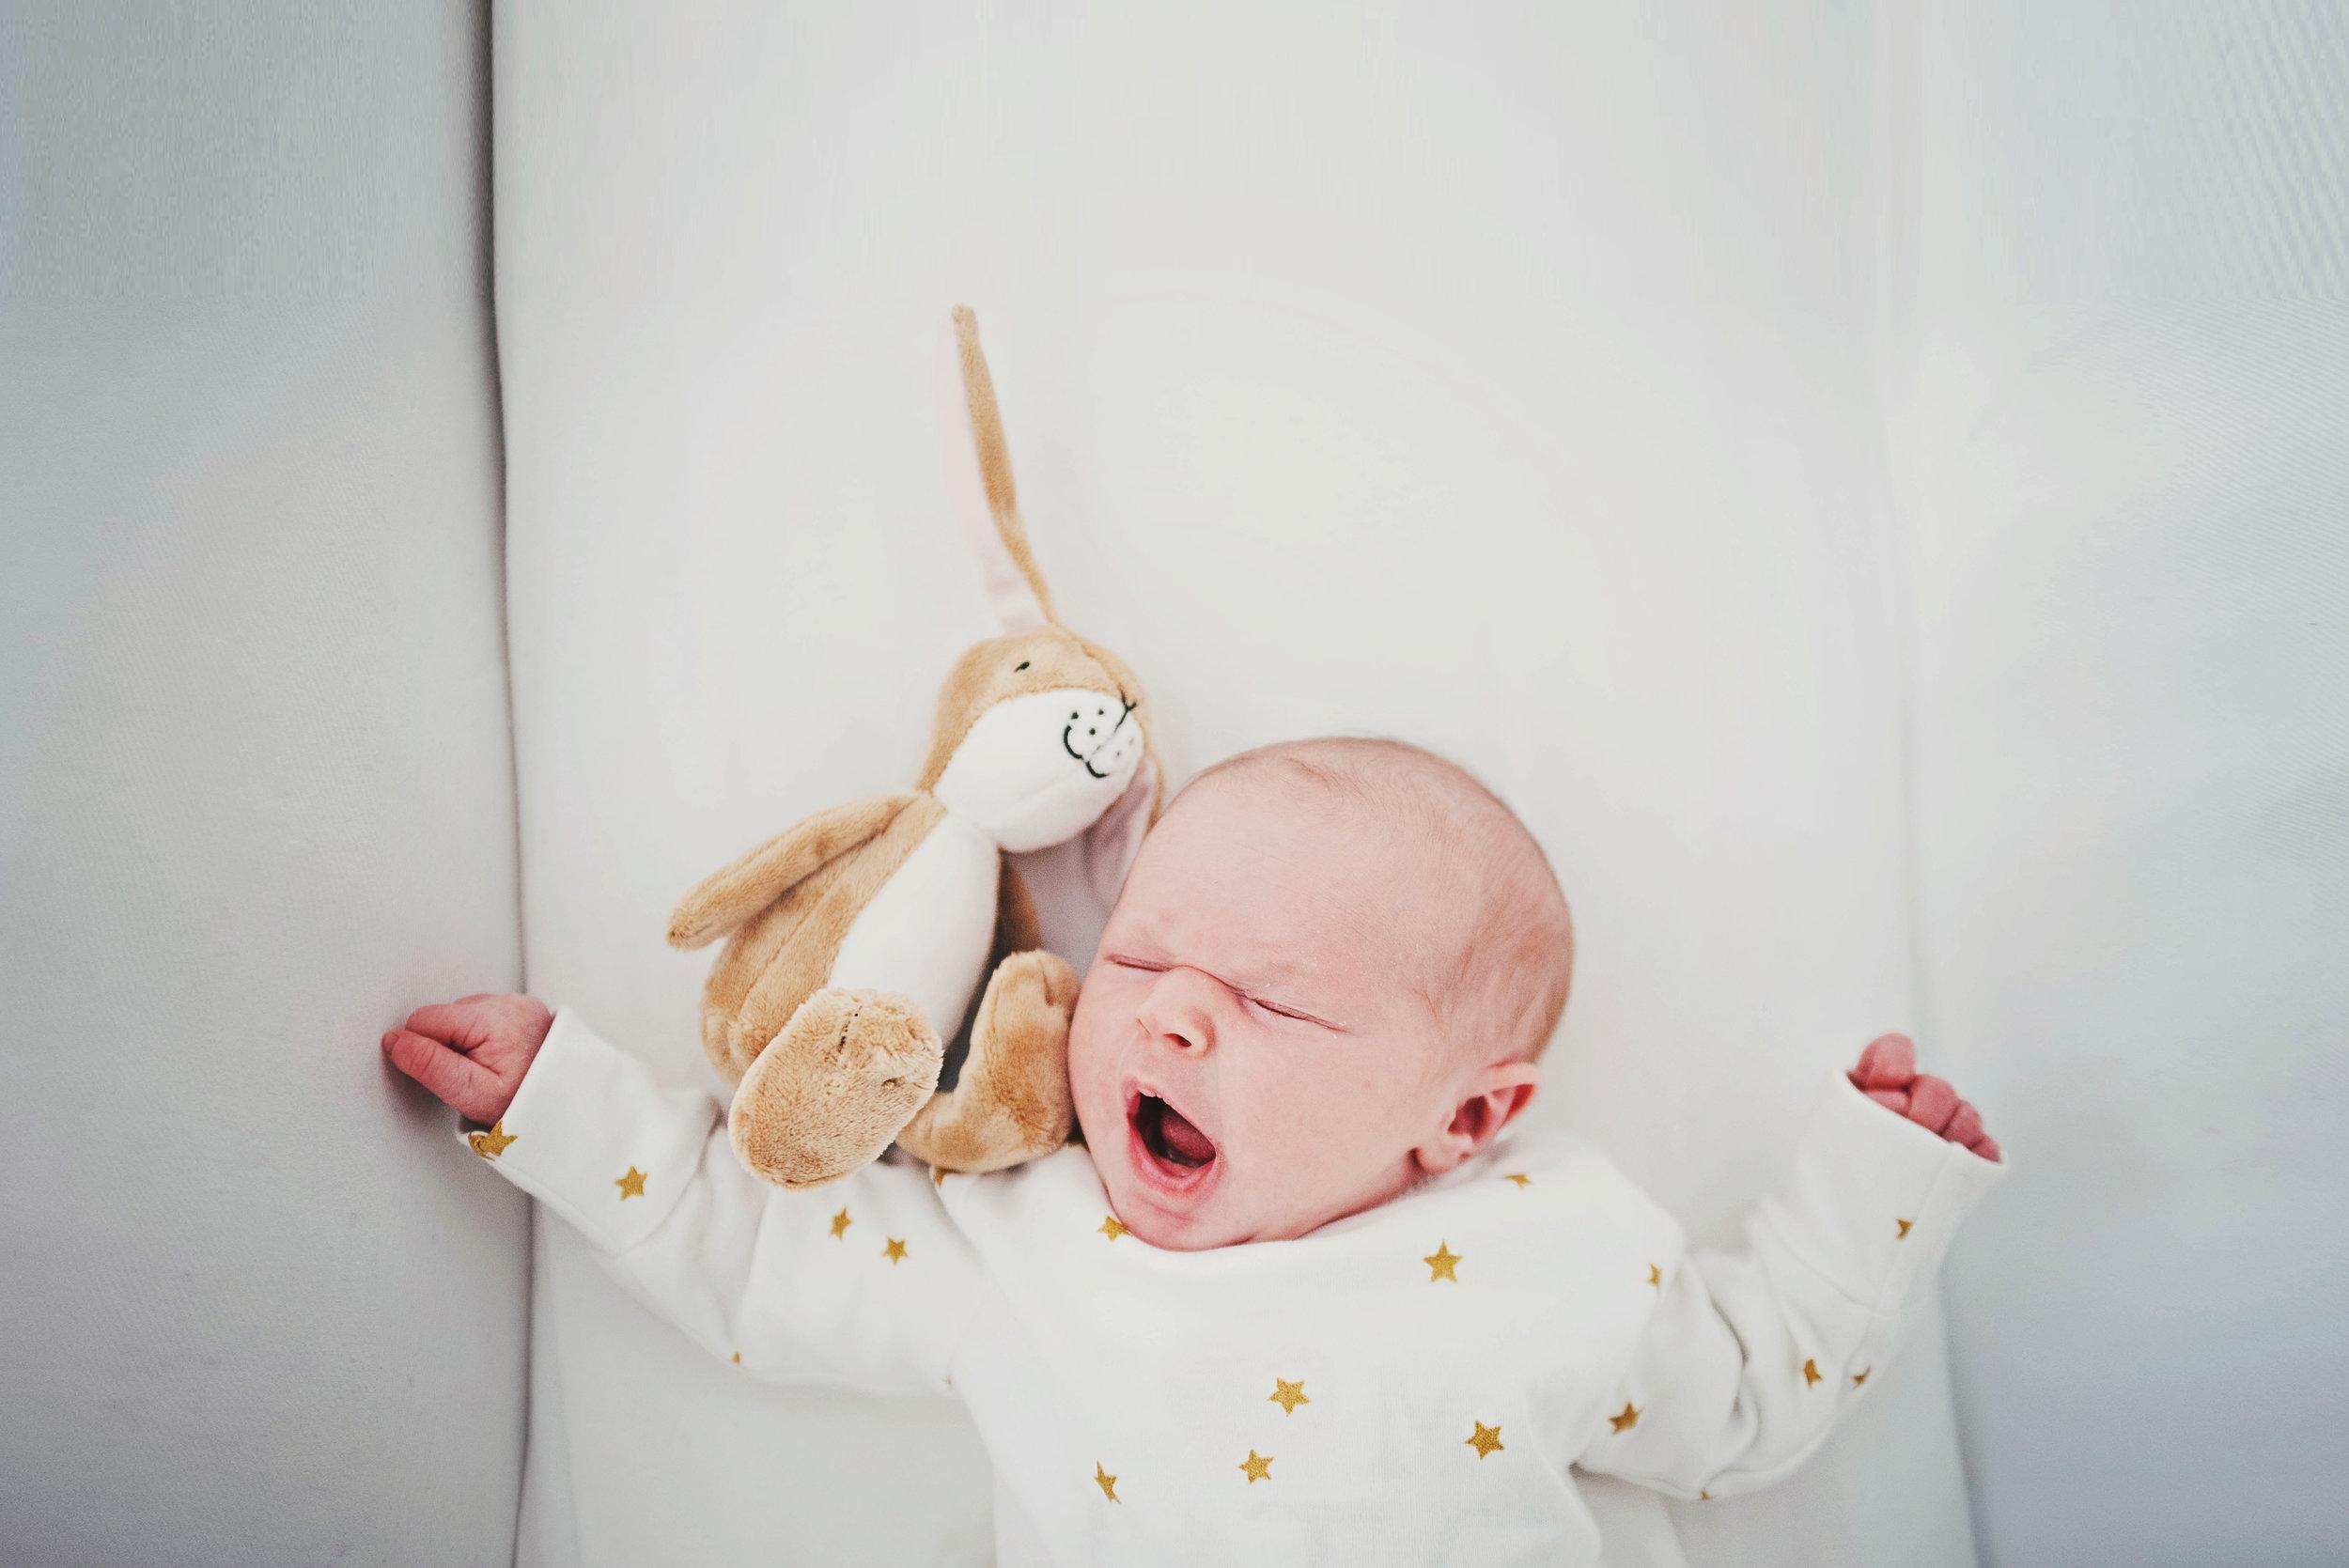 Newborn baby yawns in crib essex Documentary Portrait photographer